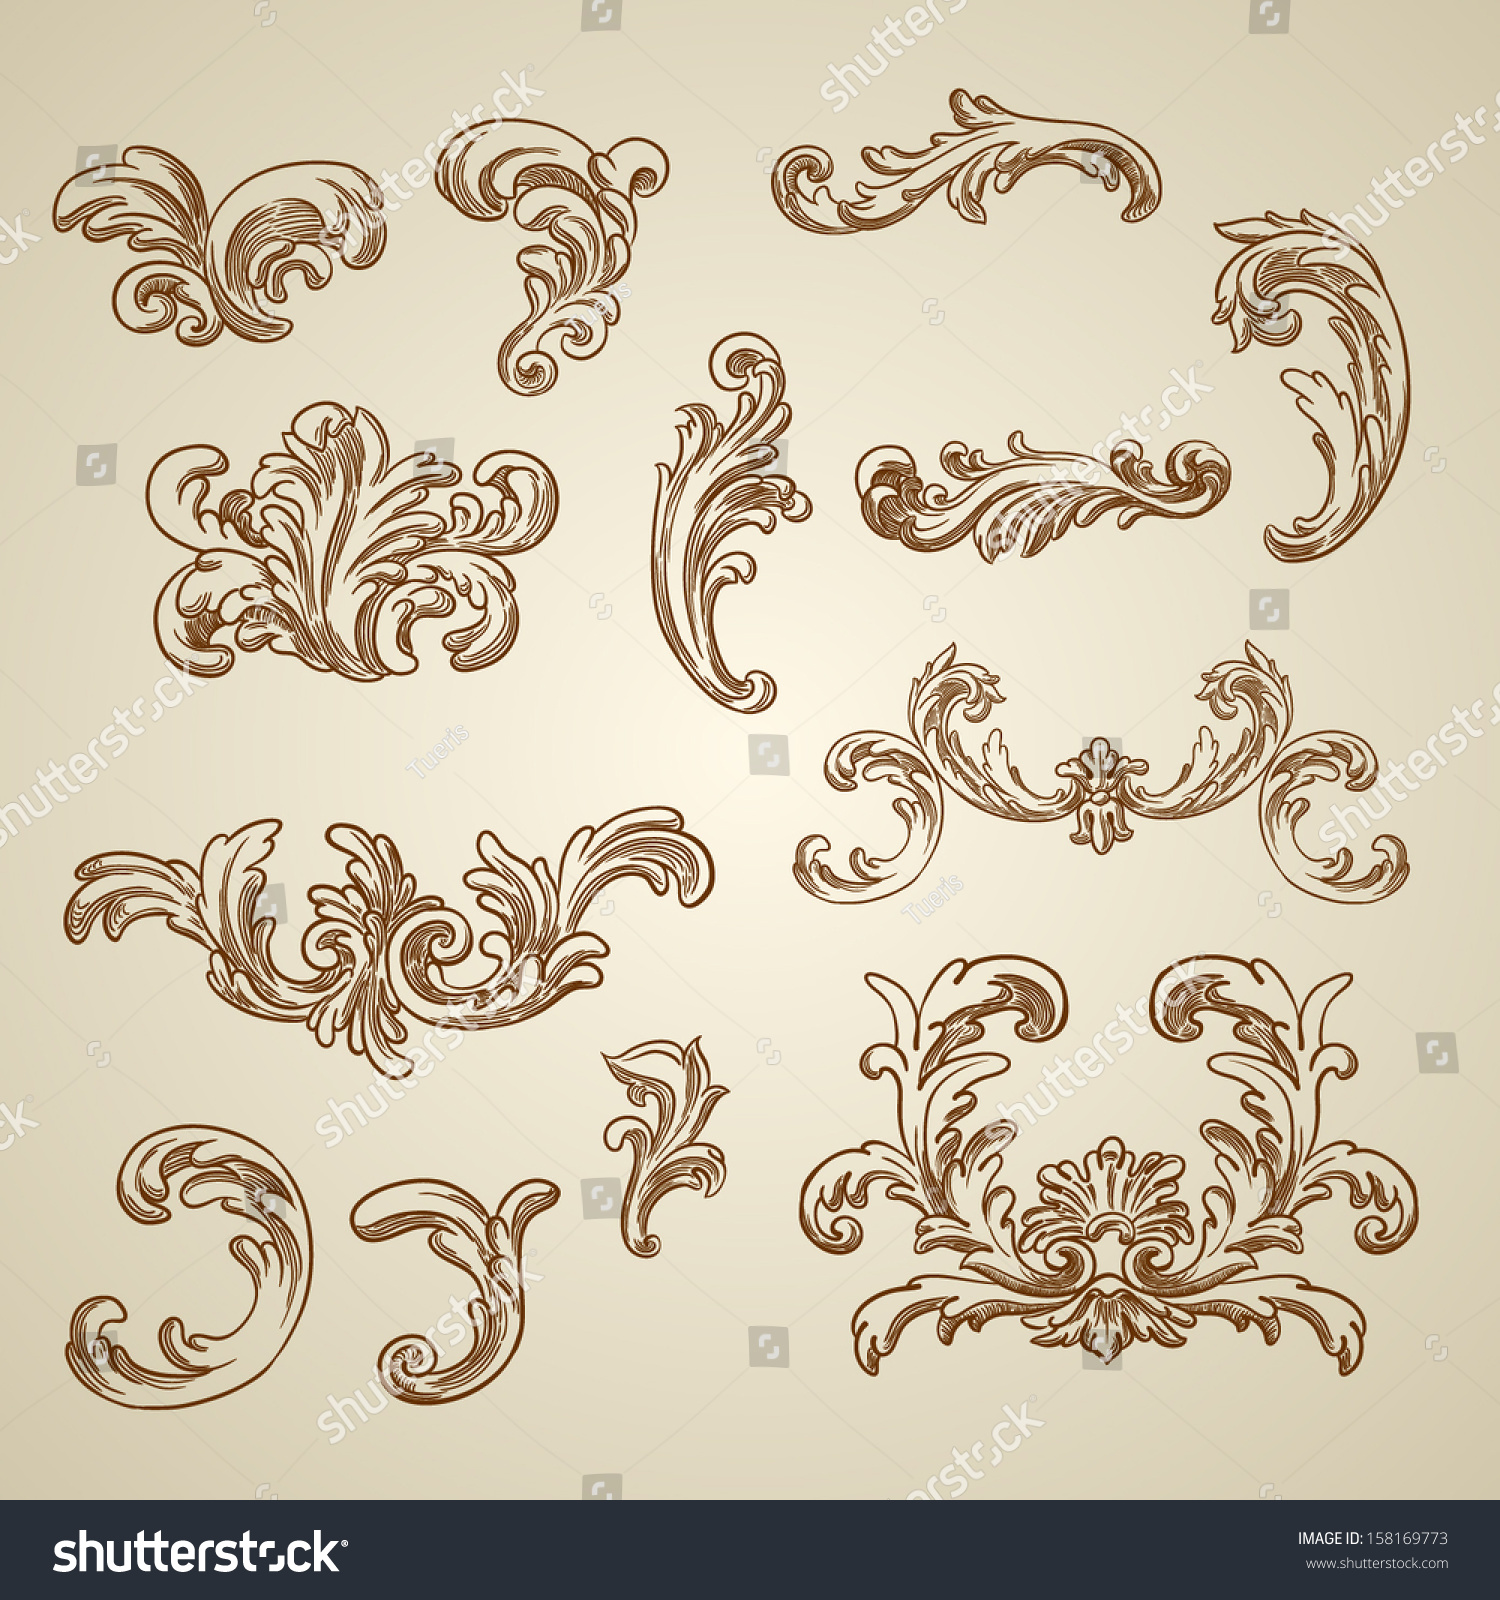 Antique Scroll Vector: Royalty-free Vector Vintage Baroque Engraving Floral